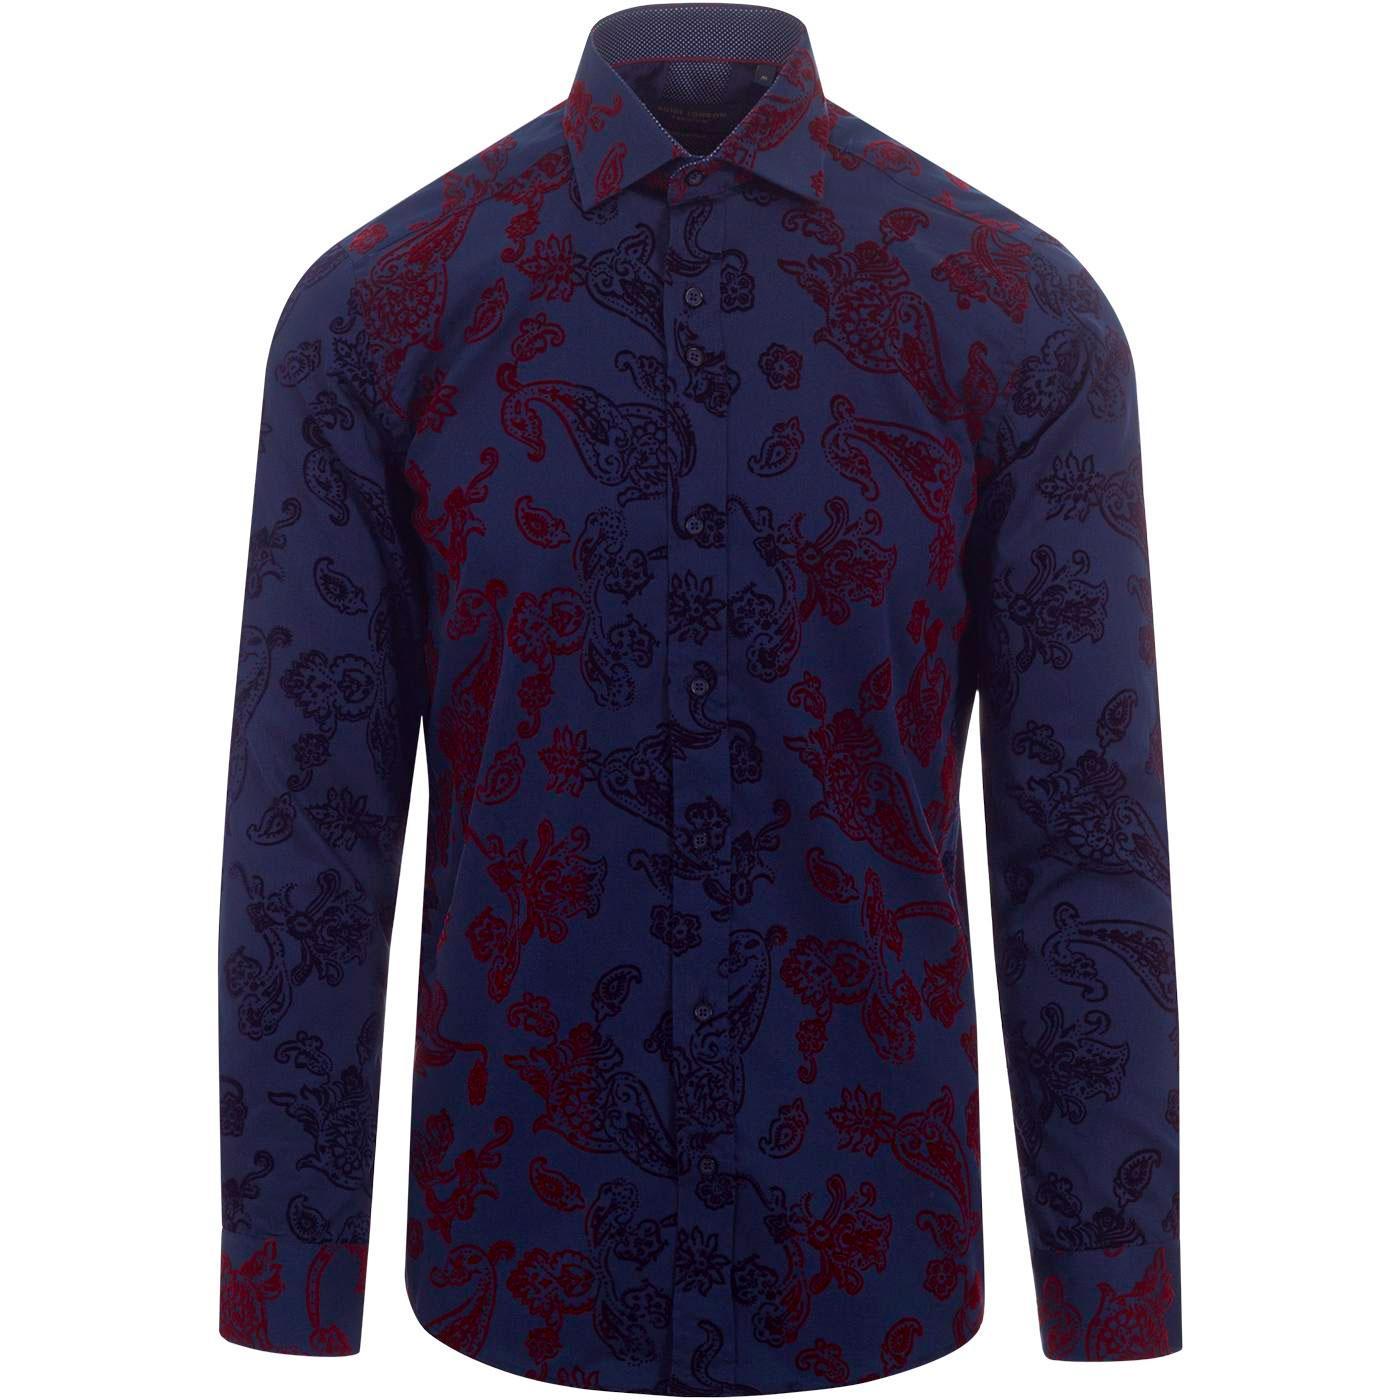 GUIDE LONDON 60s Mod Gradient Flock Floral Shirt N